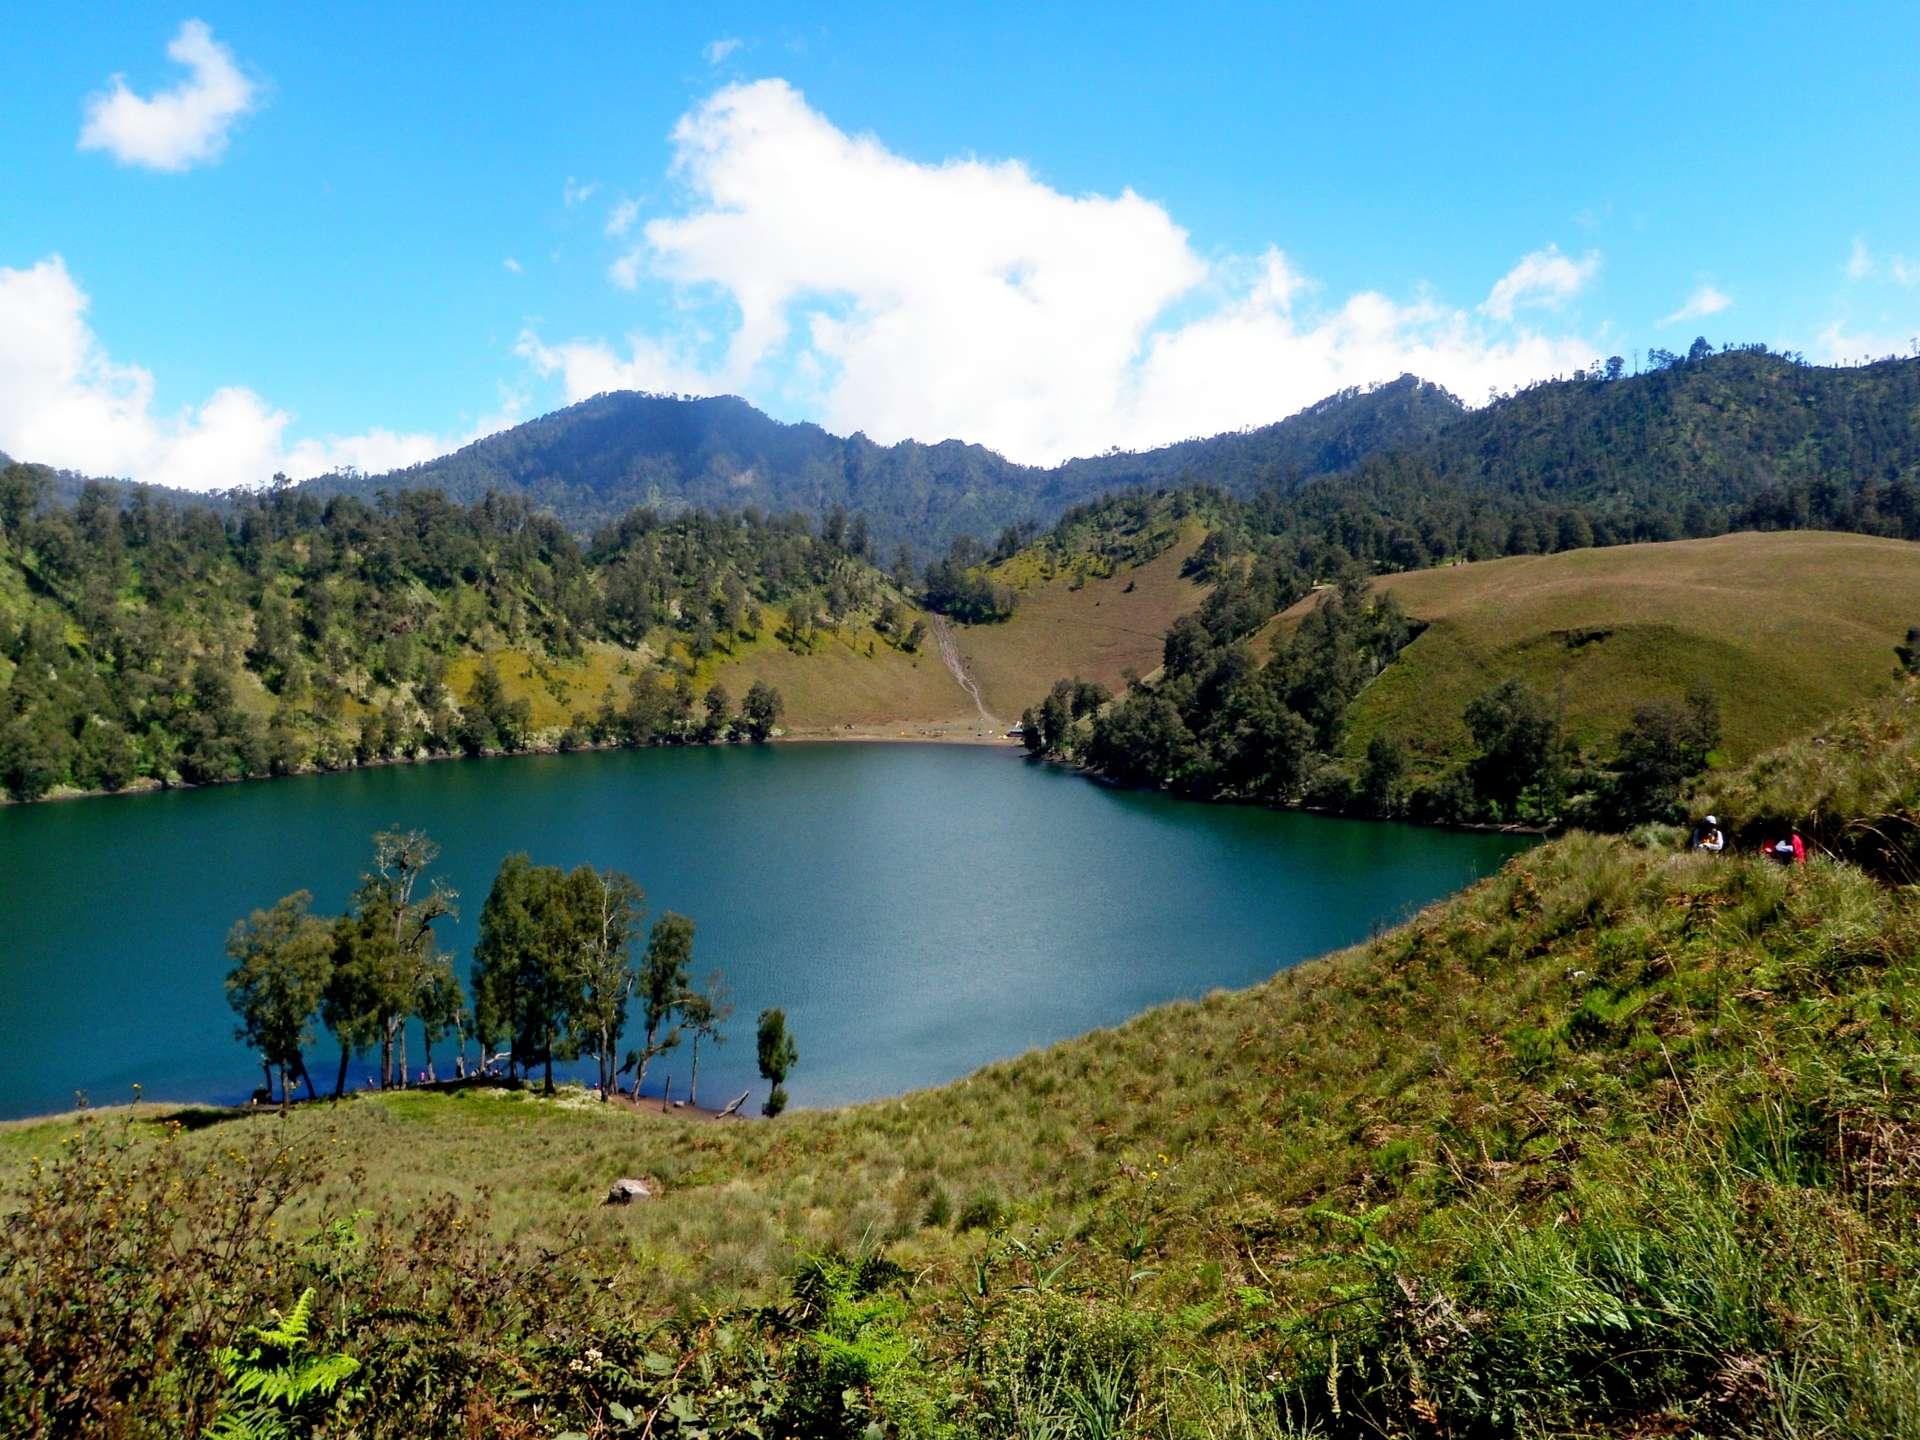 12 Destinasi Wisata Romantis Di Malang Untuk Bulan Madu